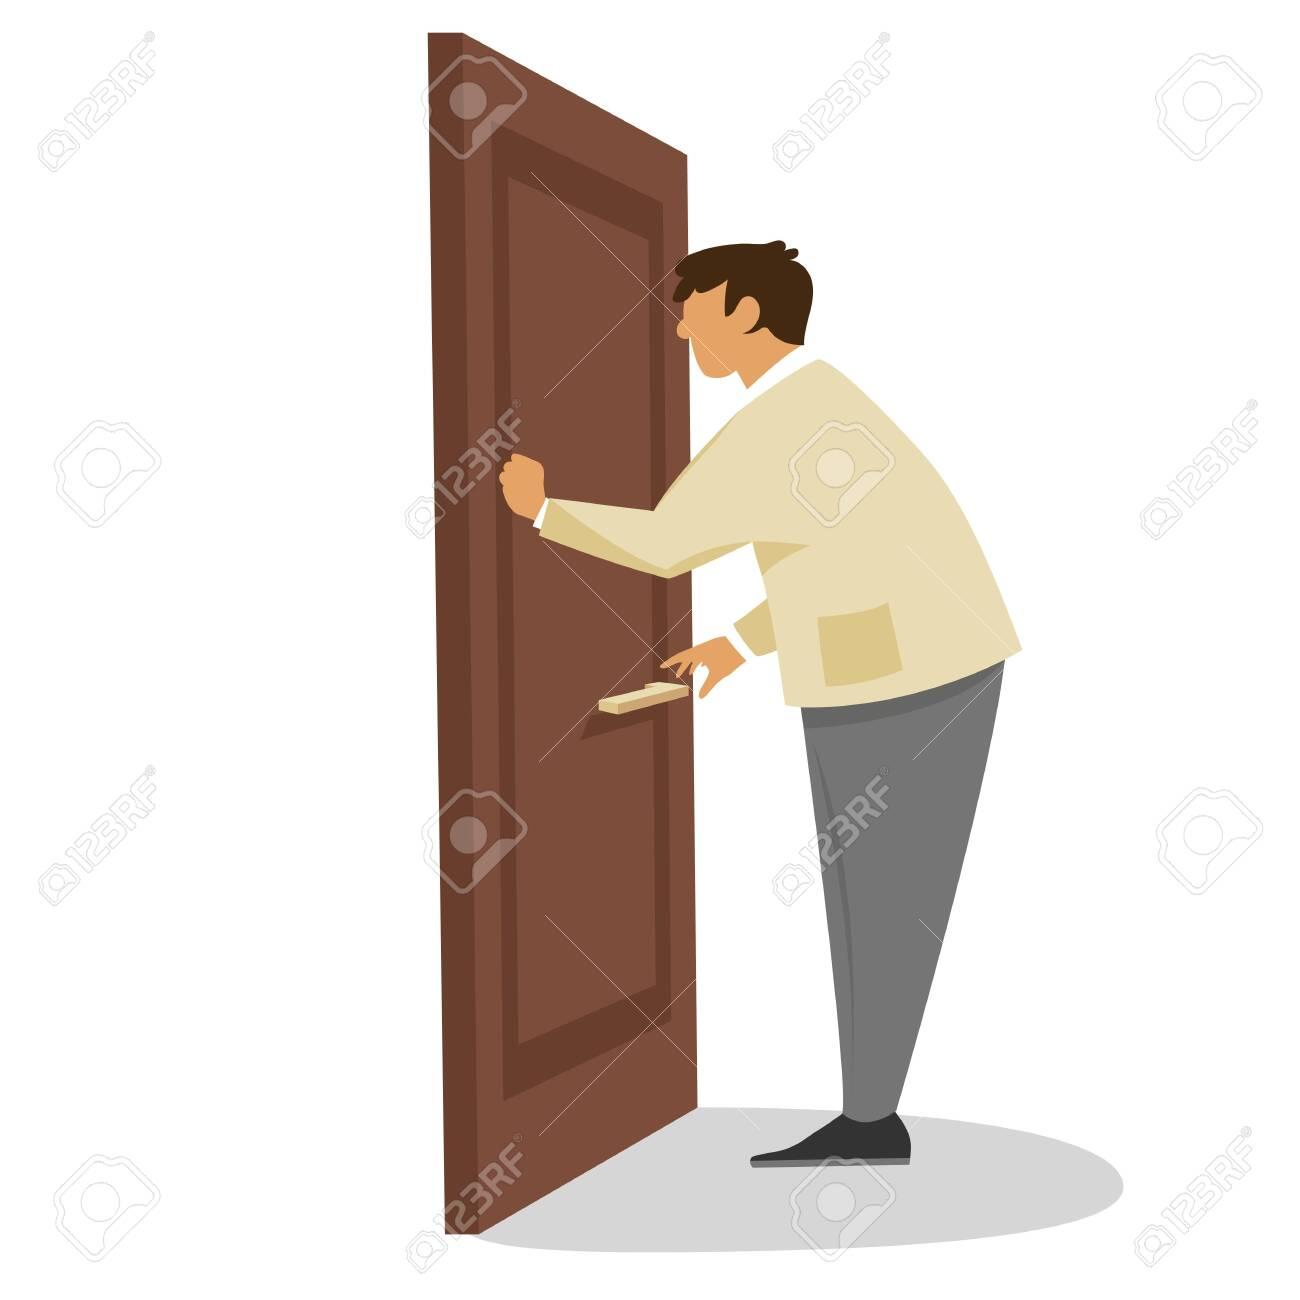 a man knocks on the door. vector flat illustration - 130213739